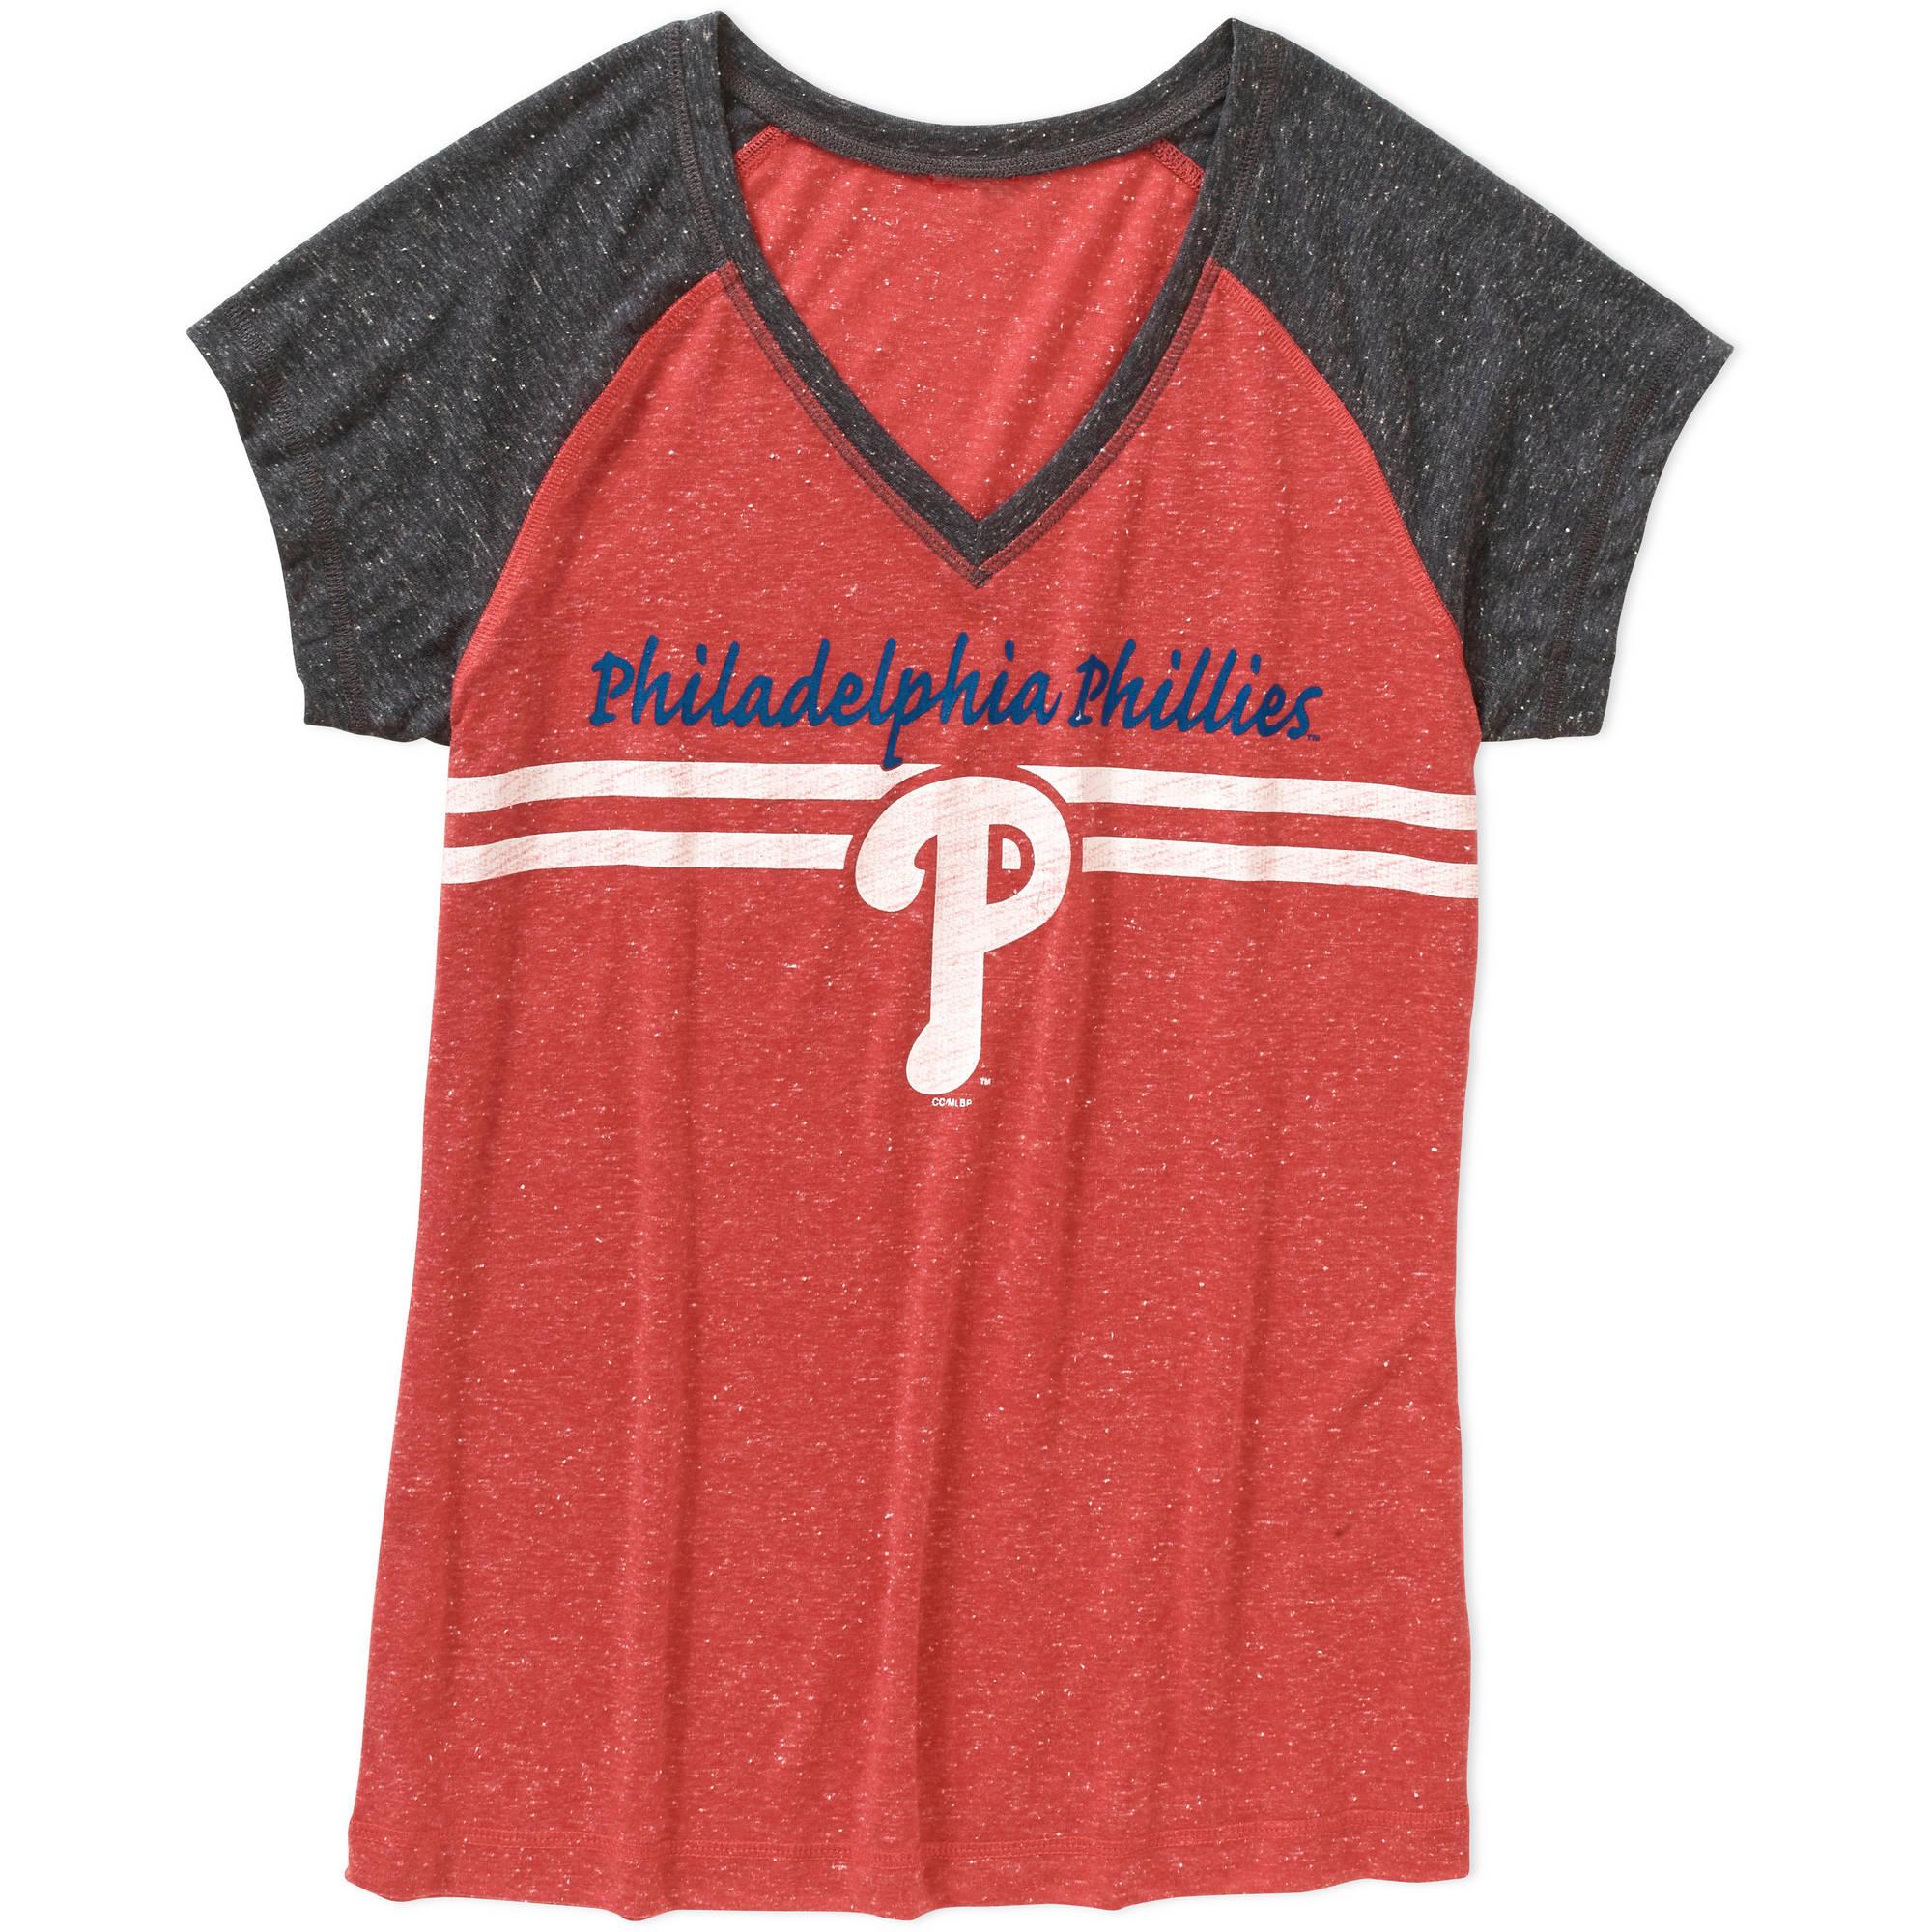 MLB Women's Philadelphia Phillies Short Sleeve Top